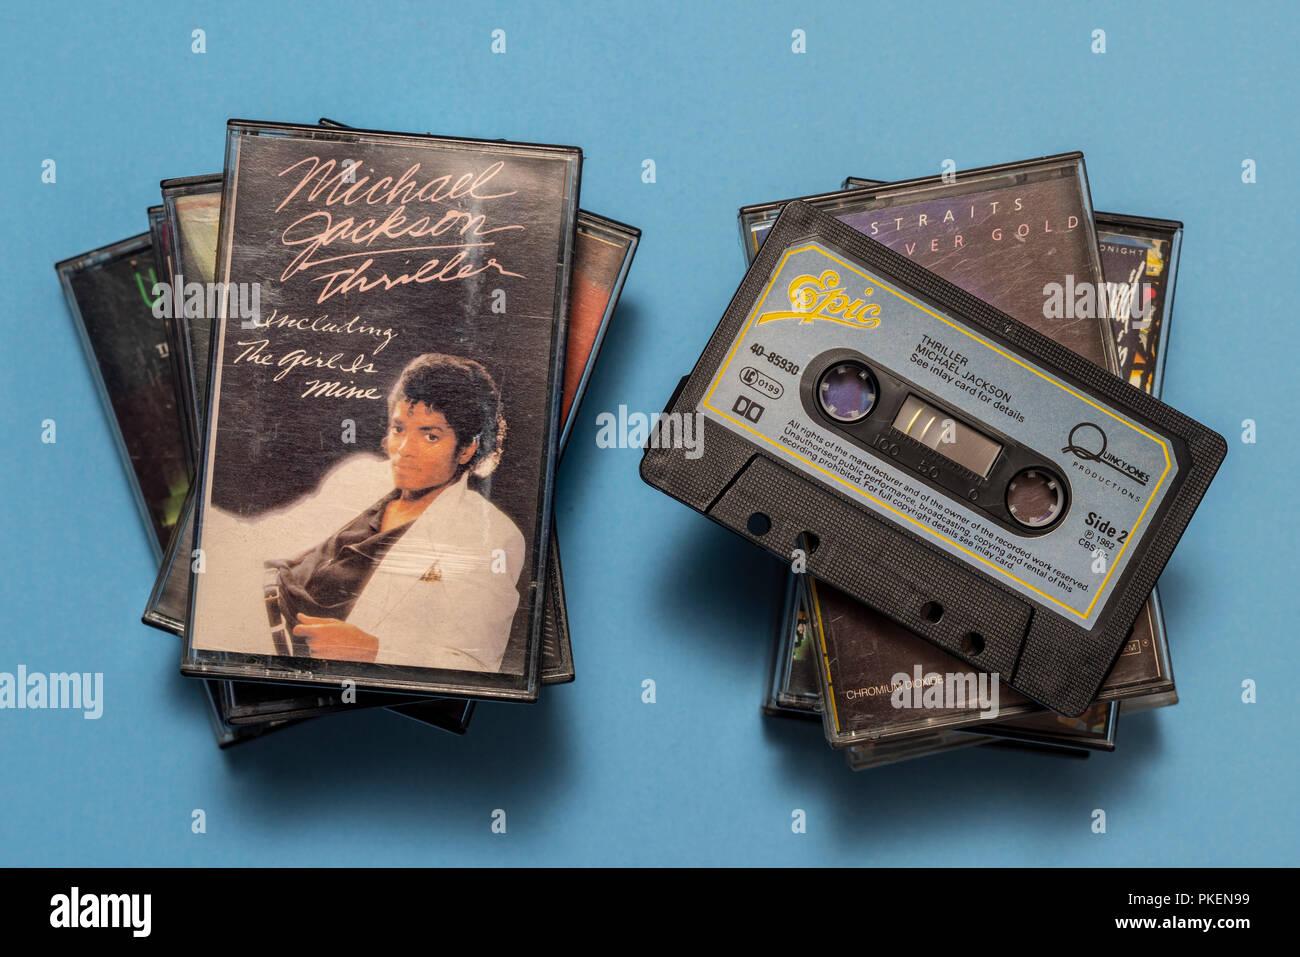 compact audio cassette of Michael Jackson, Thriller album with art work. - Stock Image